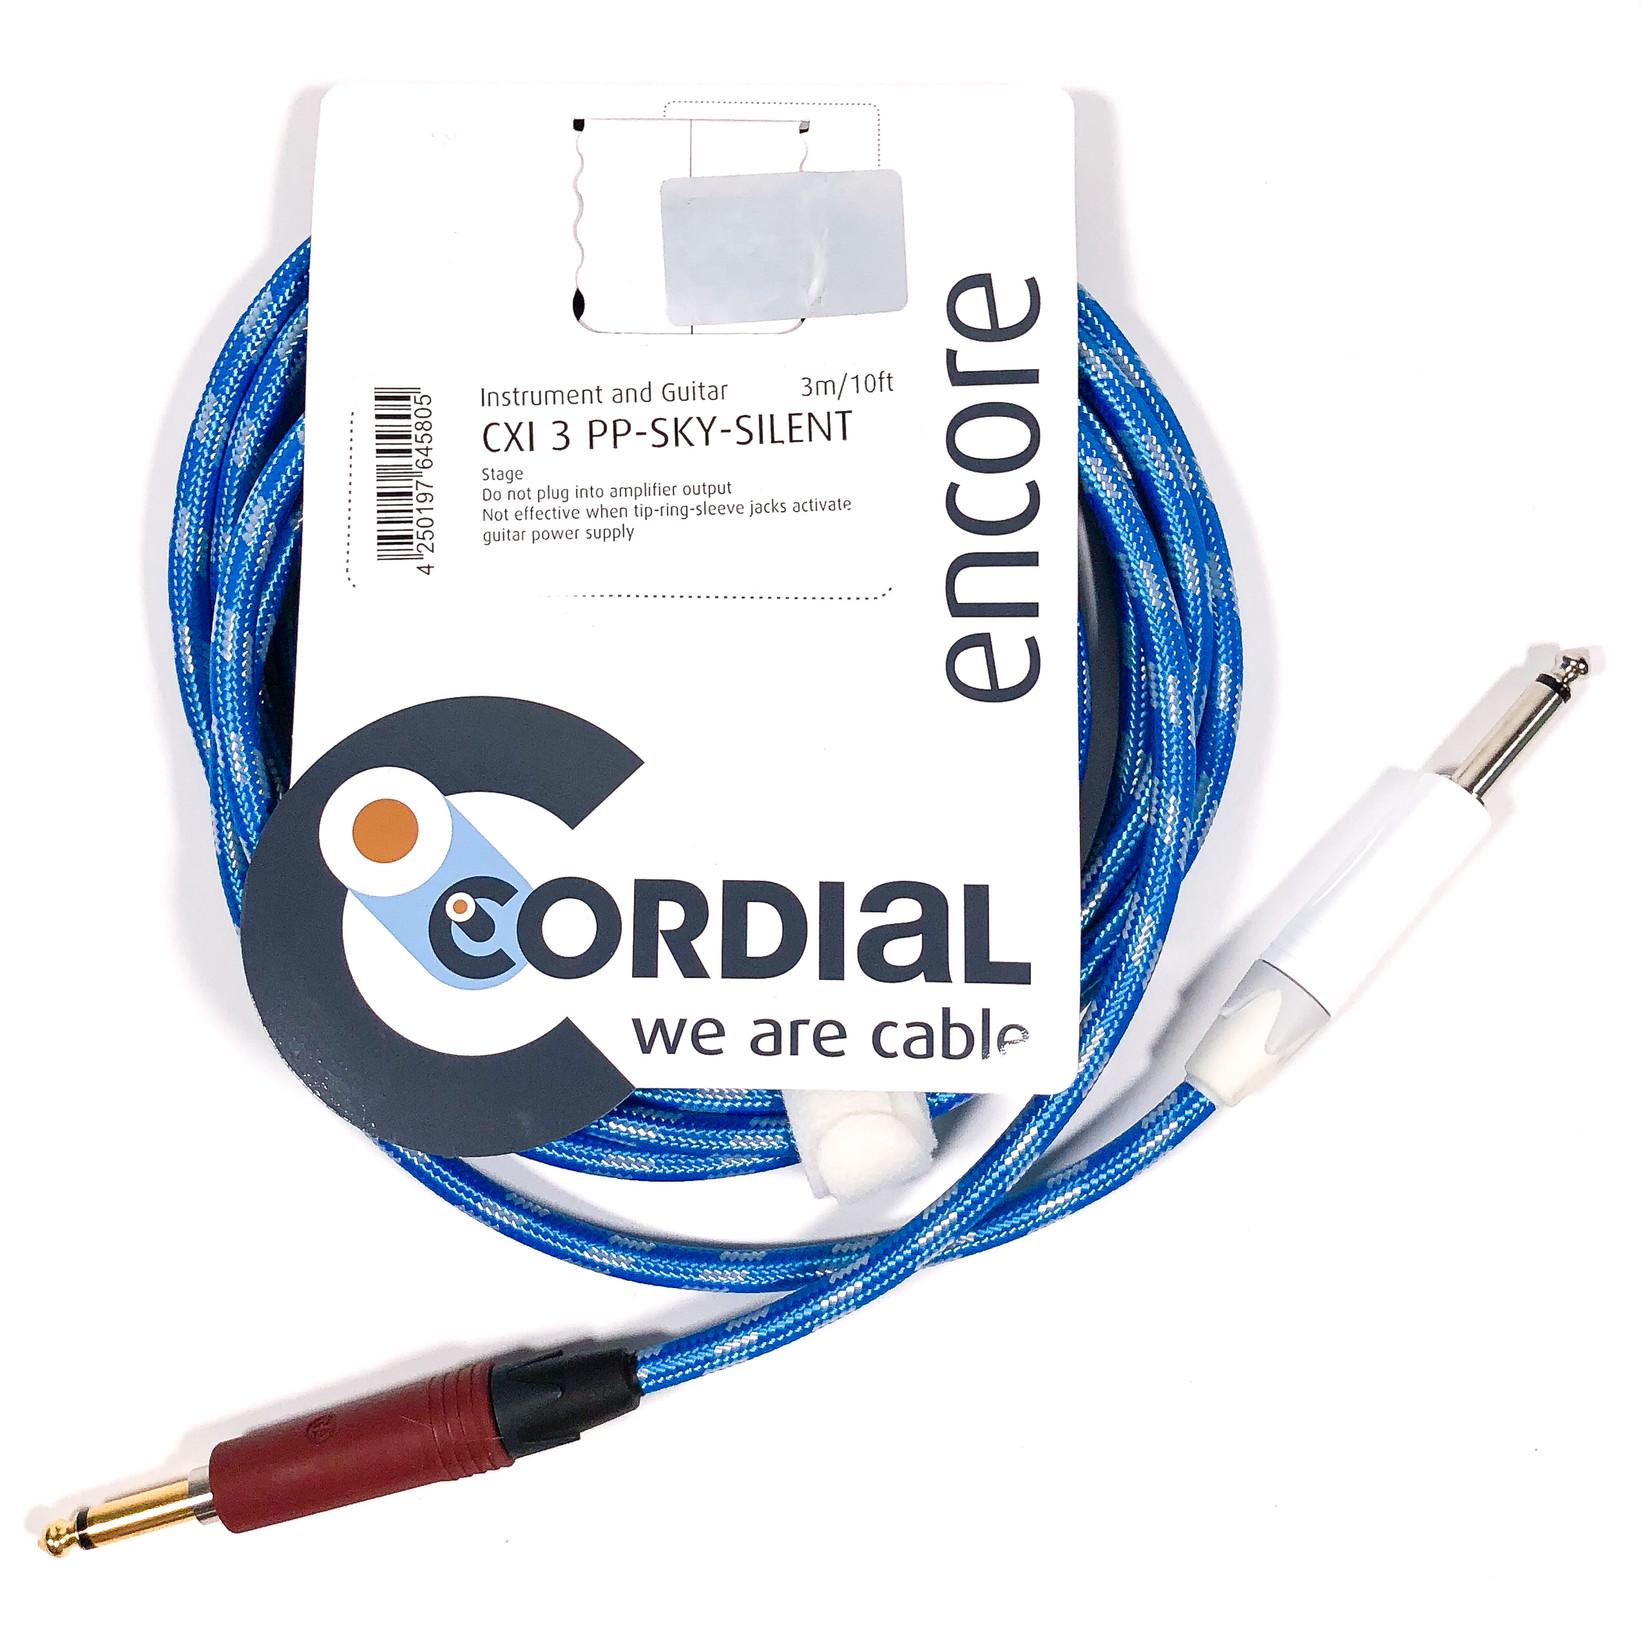 Cordial Cables Cordial 3m /~10ft Inst. Cable, 1/4'' Neutrik Conns. w/ silentPLUG , CXI 3 PP-SKY-SILENT (Germany)